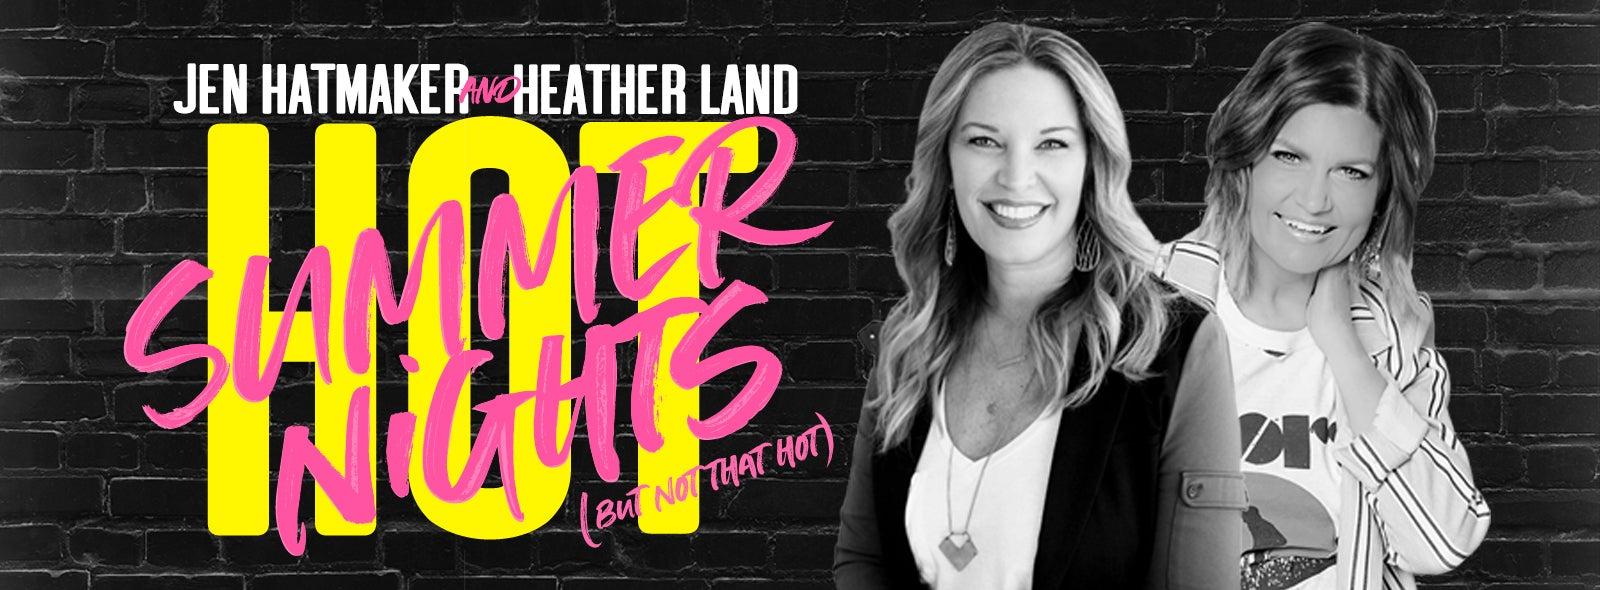 Jen Hatmaker & Heather Land